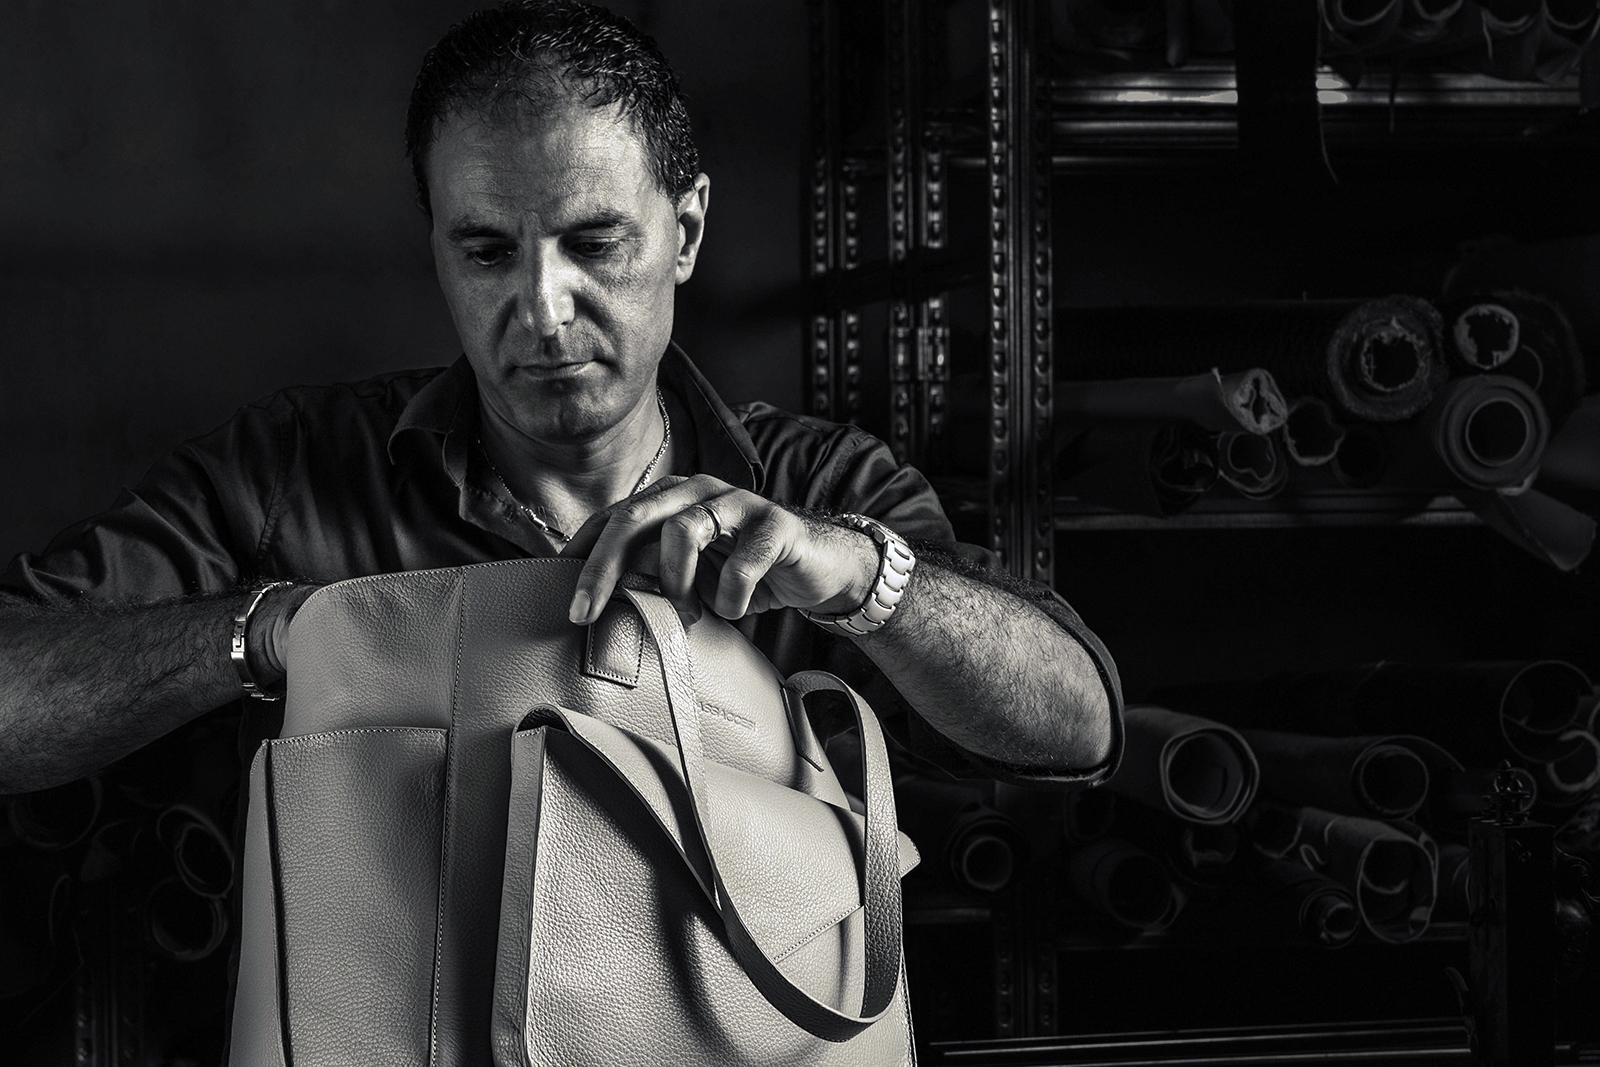 Italian designer Marco Massaccesi